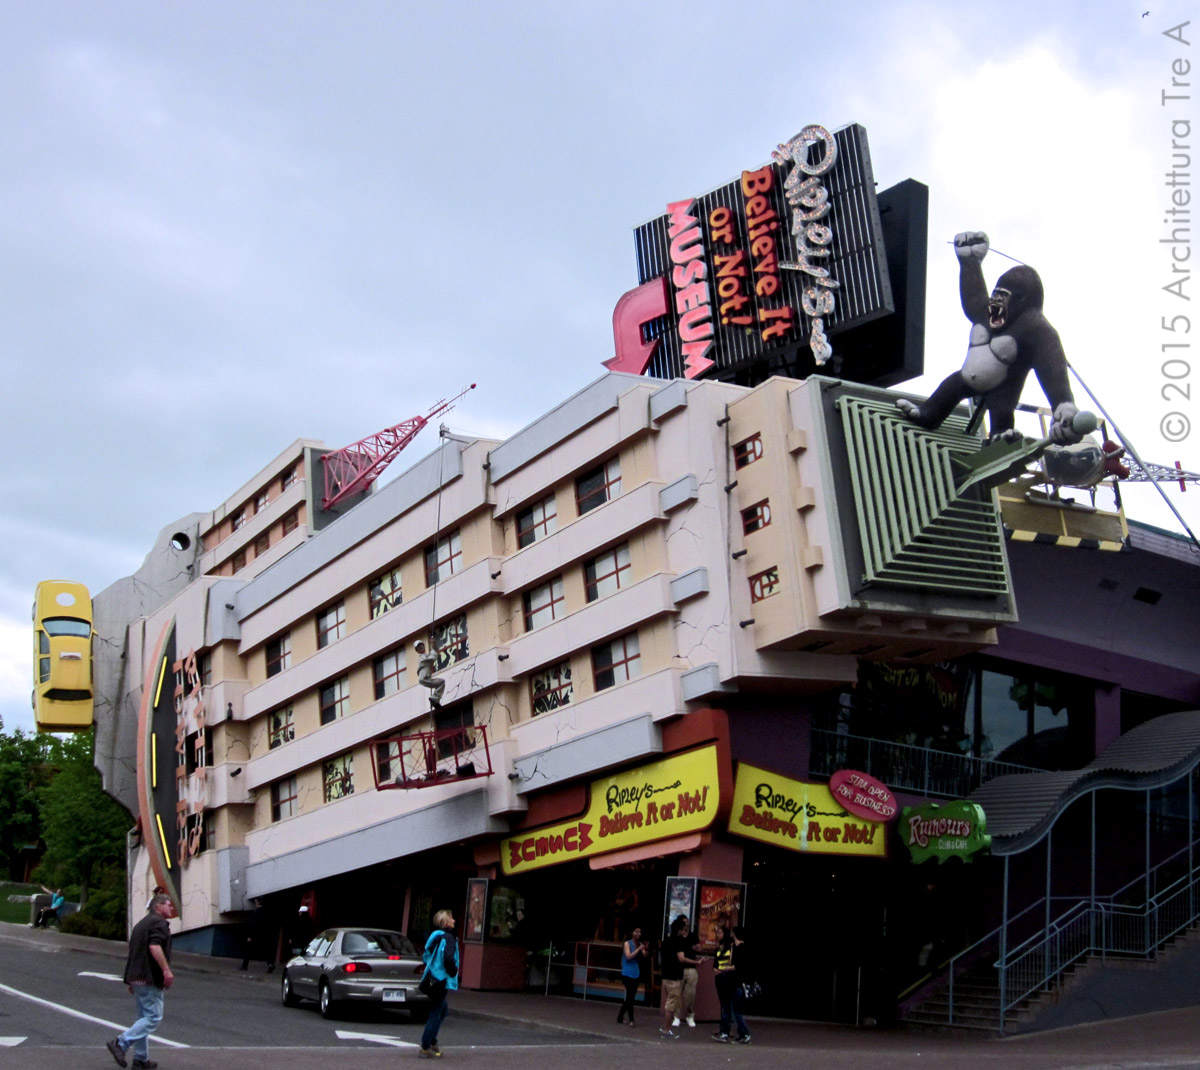 Ripley's Museum